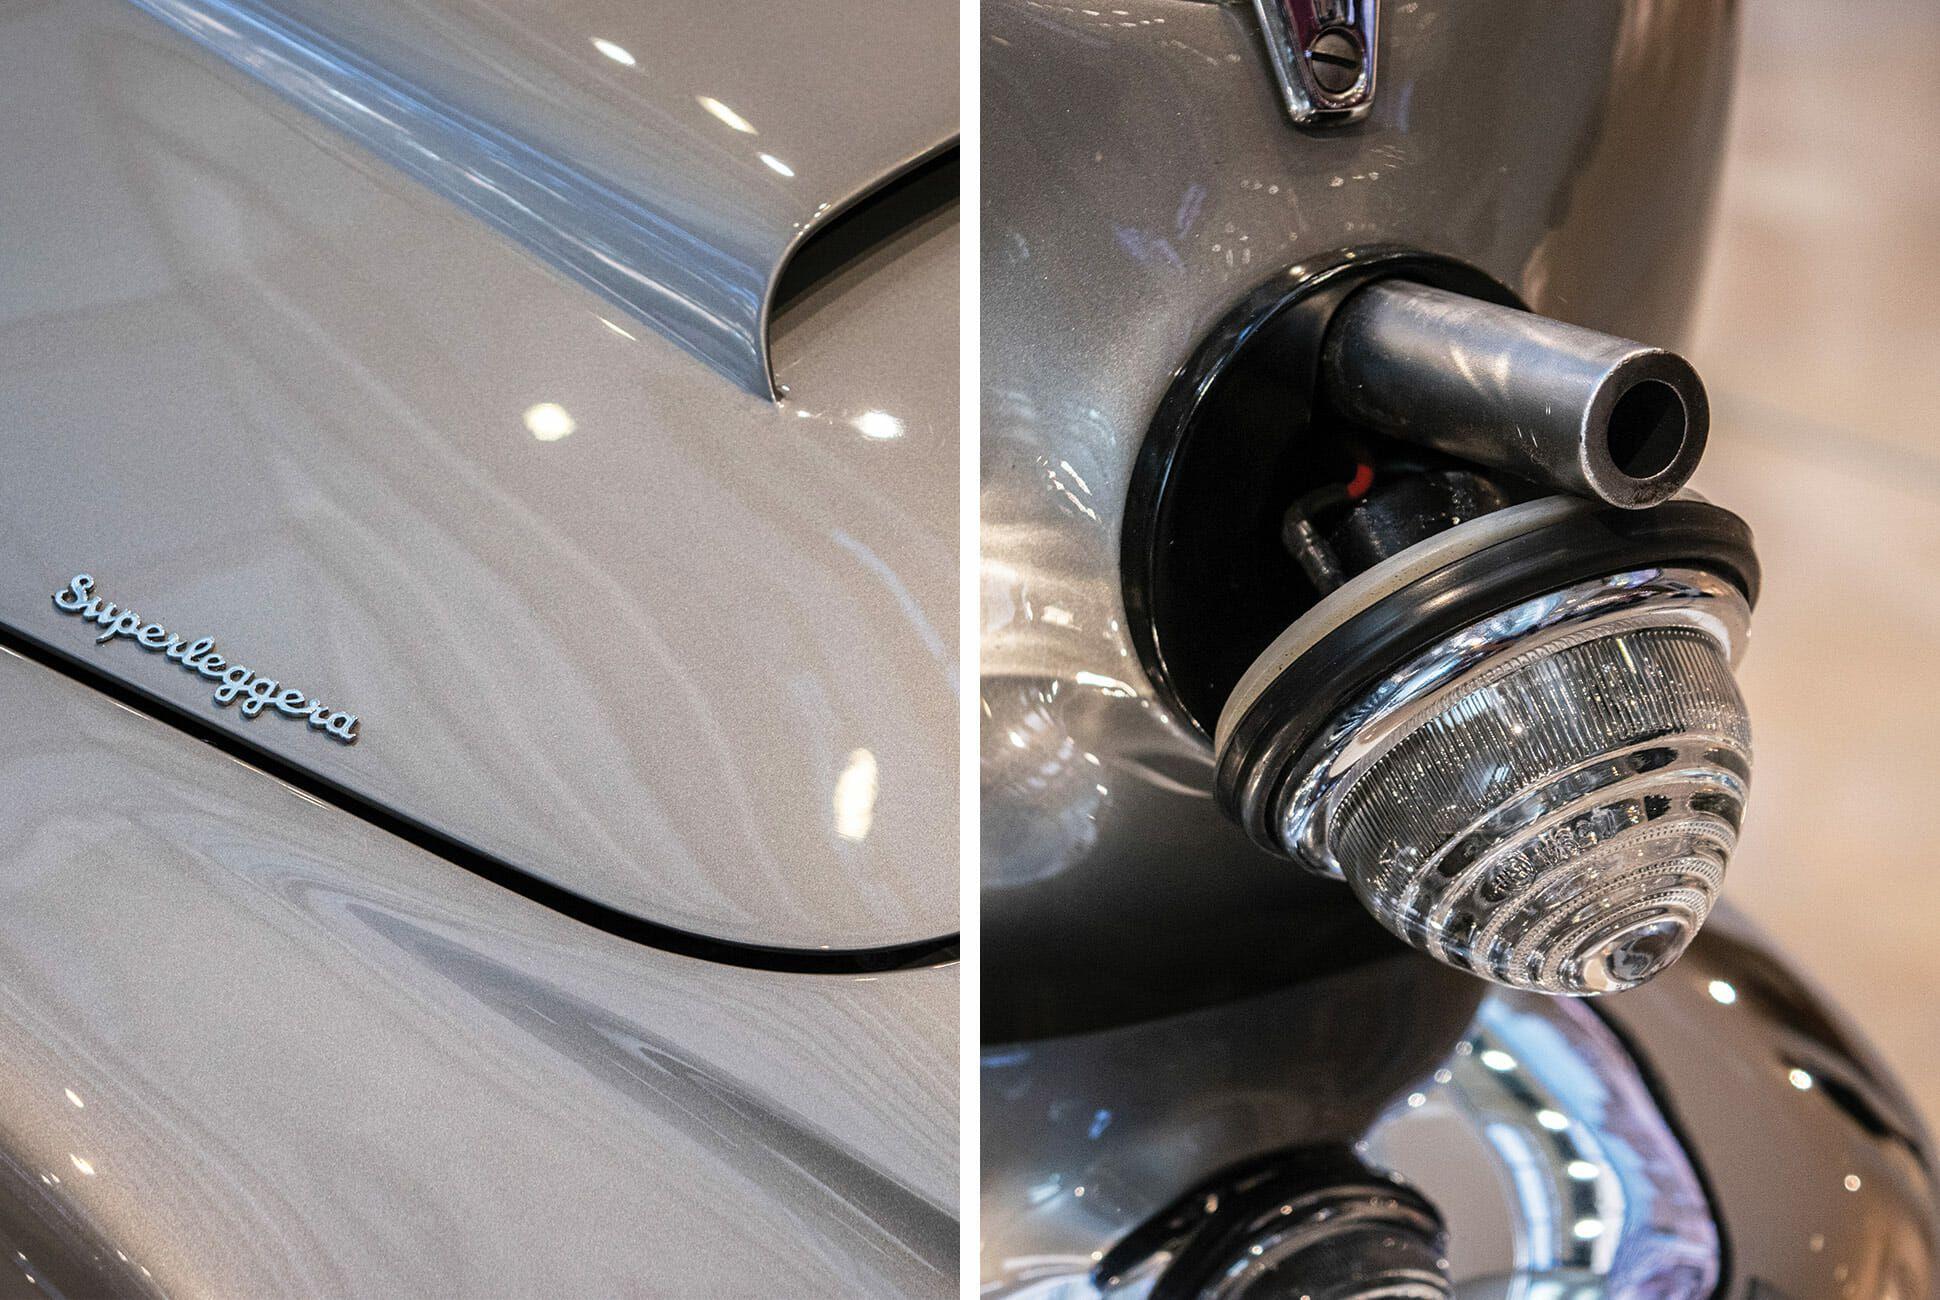 James-Bond-Aston-Martin-DB5-gear-patrol-slide-2